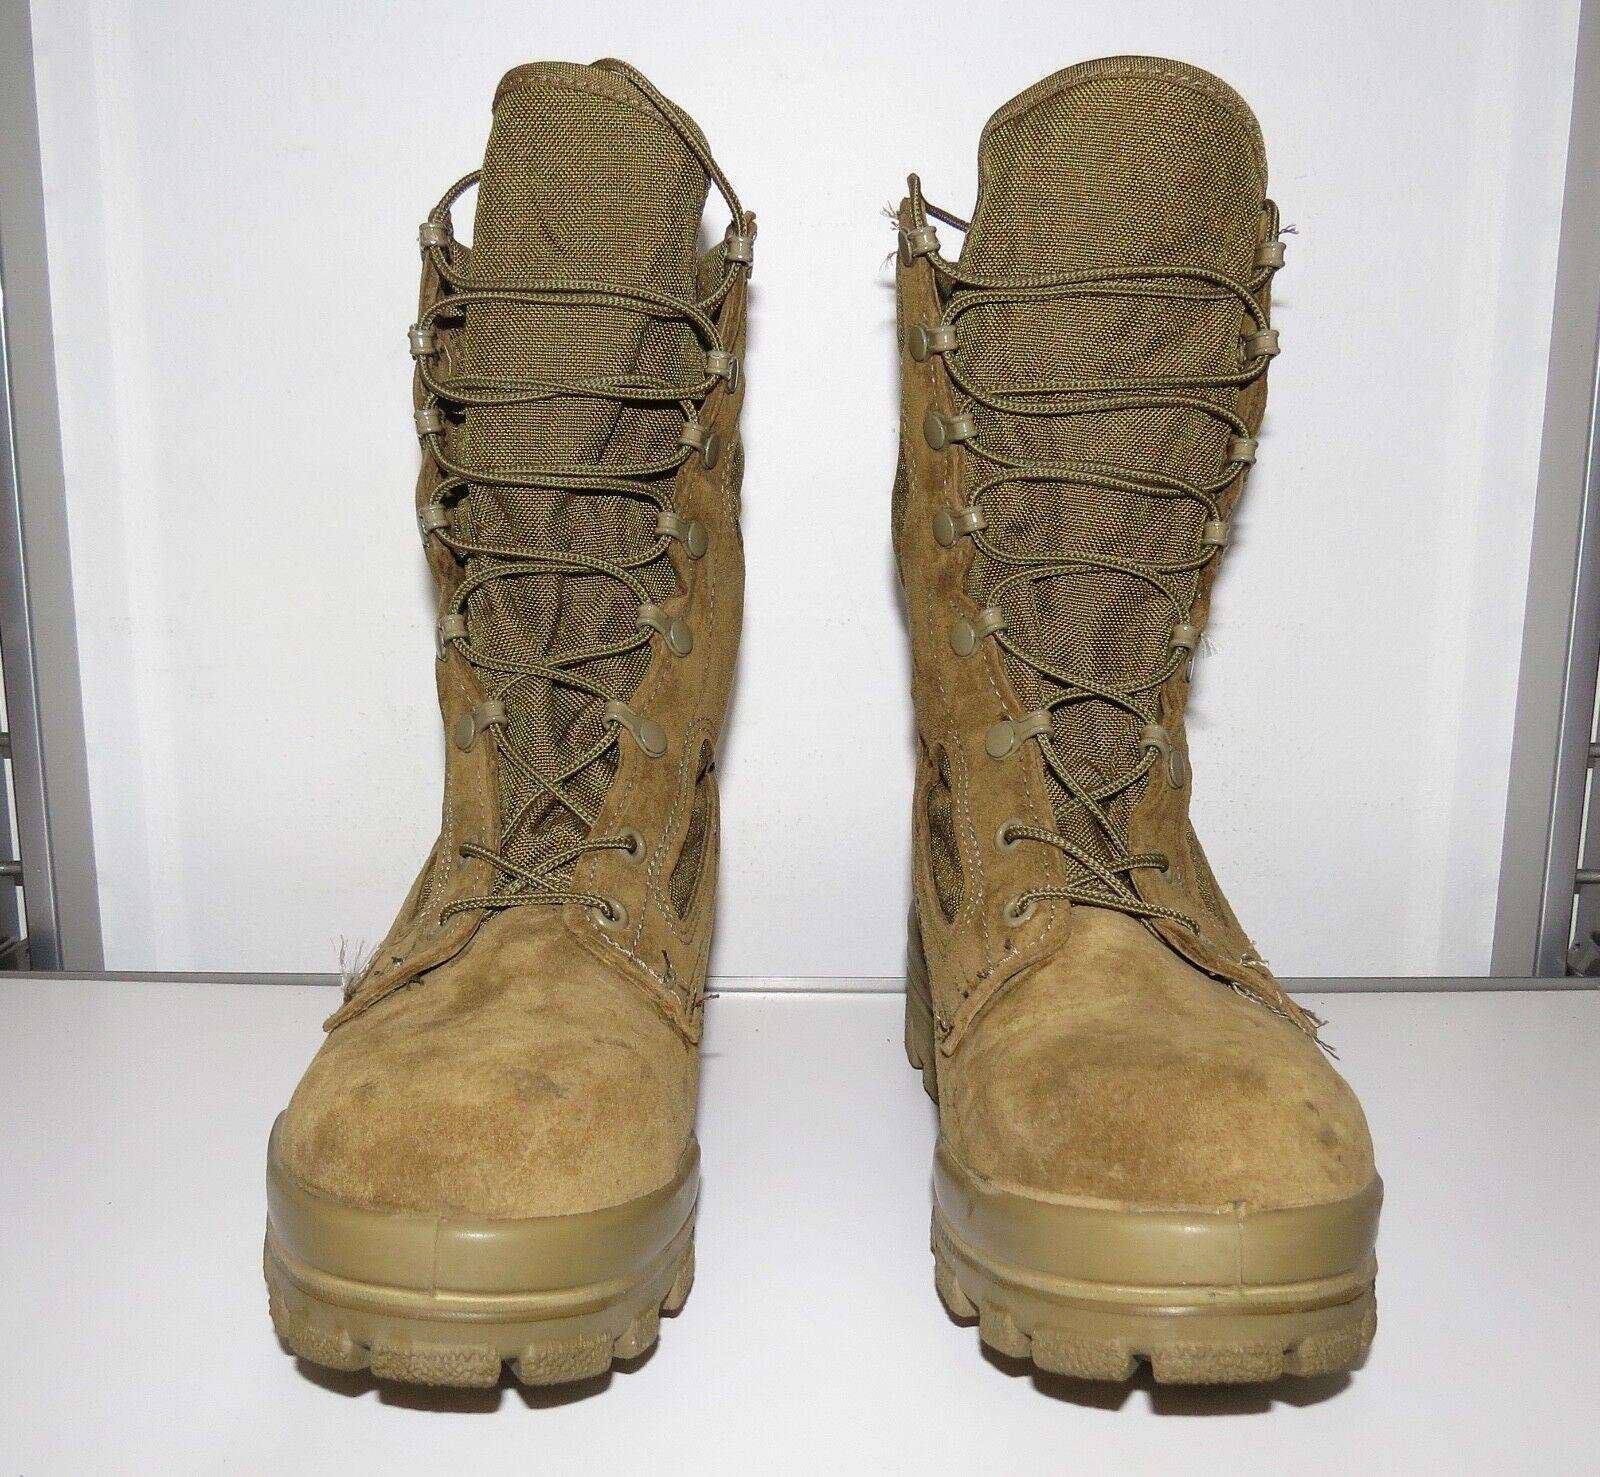 popolare USMC BATES Hot Hot Hot weather Steel toe stivali Uomo 7 EW MARSOC Marines  distribuzione globale